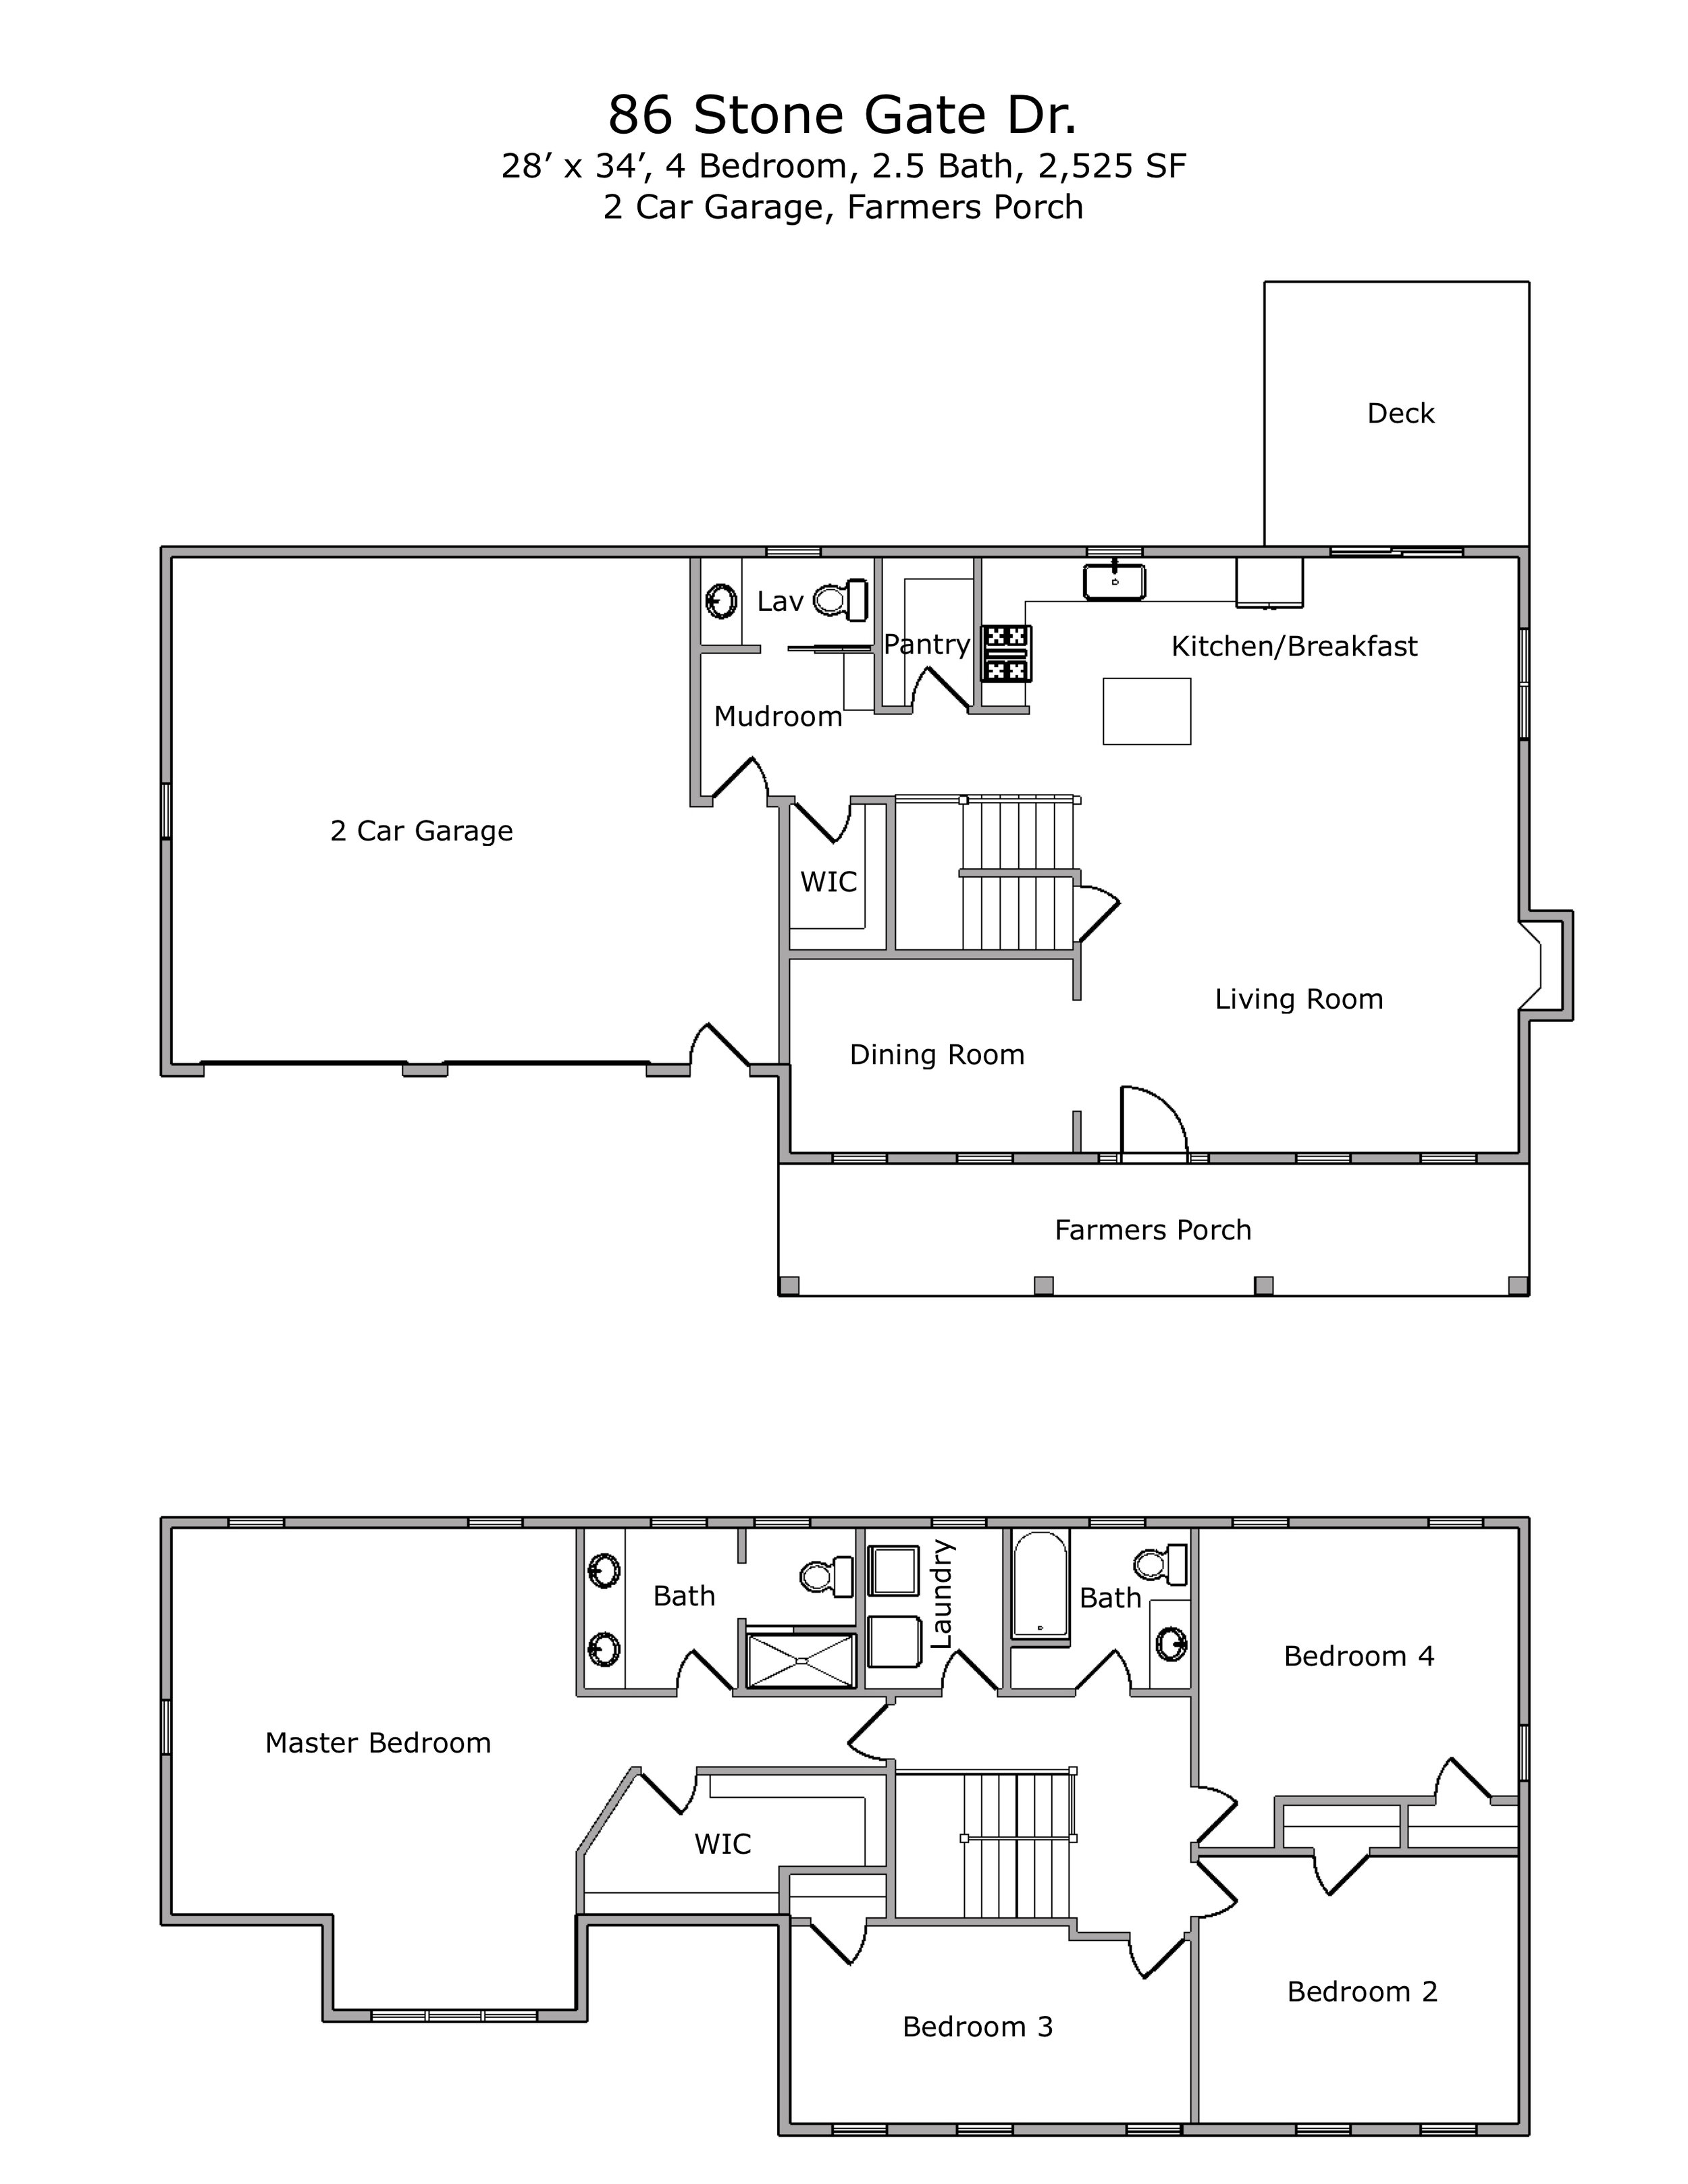 2019-01-11 - 86 sgd layout floor plan.jpg